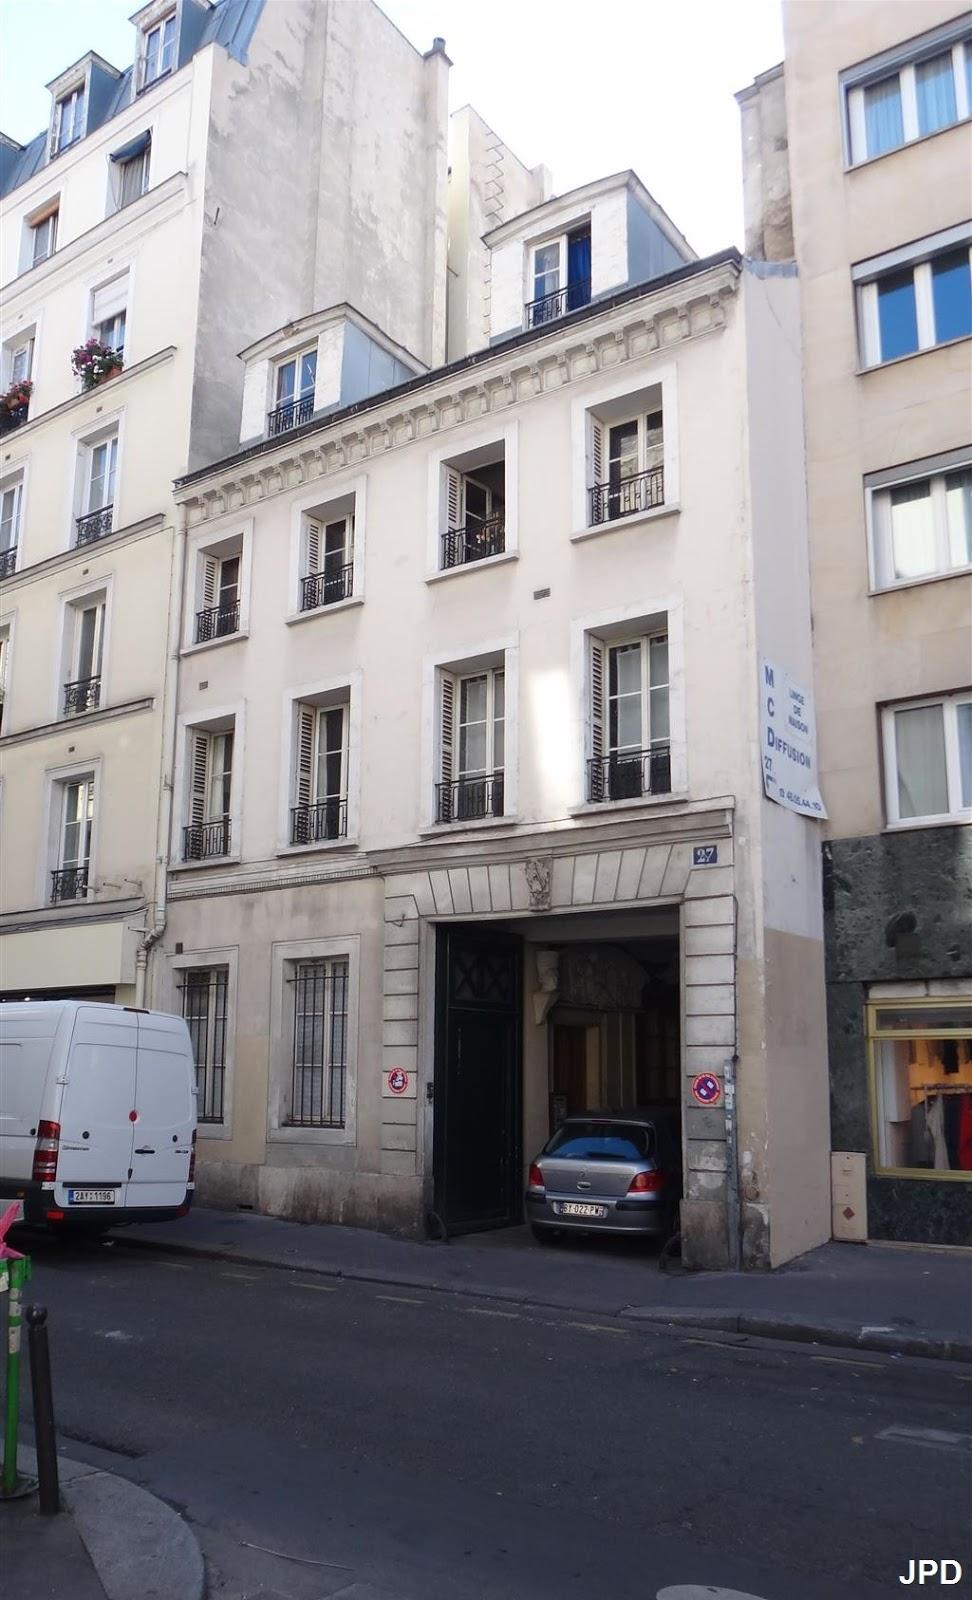 paris bise art sculptures 27 rue popincourt. Black Bedroom Furniture Sets. Home Design Ideas